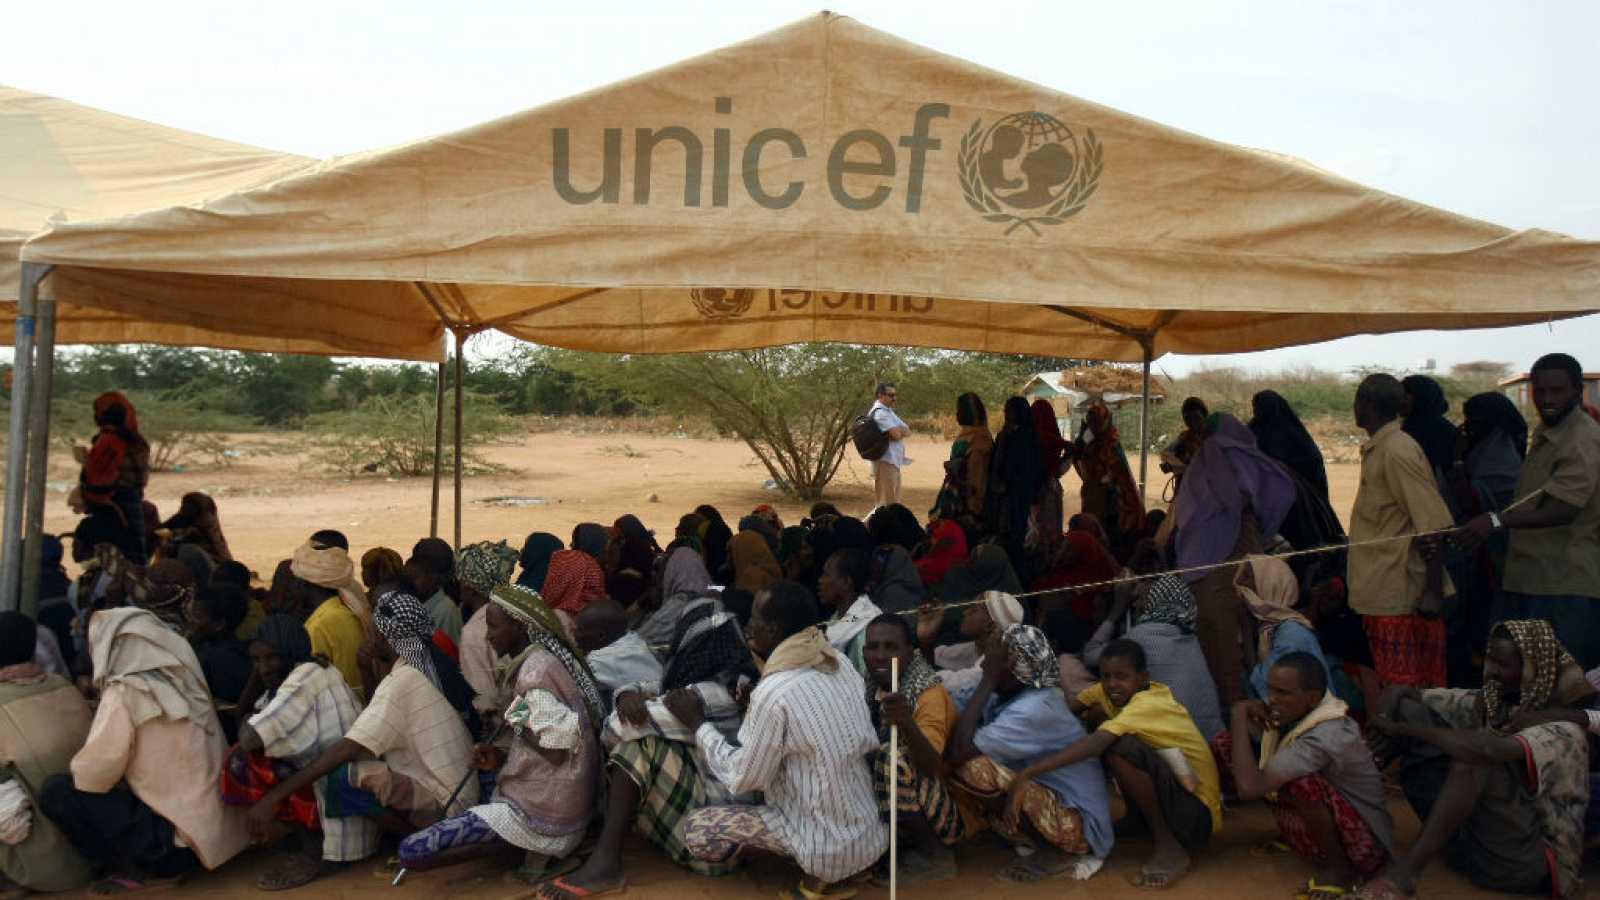 Boletines RNE - Cinco Continentes de RNE, premio 'Comunica' de UNICEF - Escuchar ahora